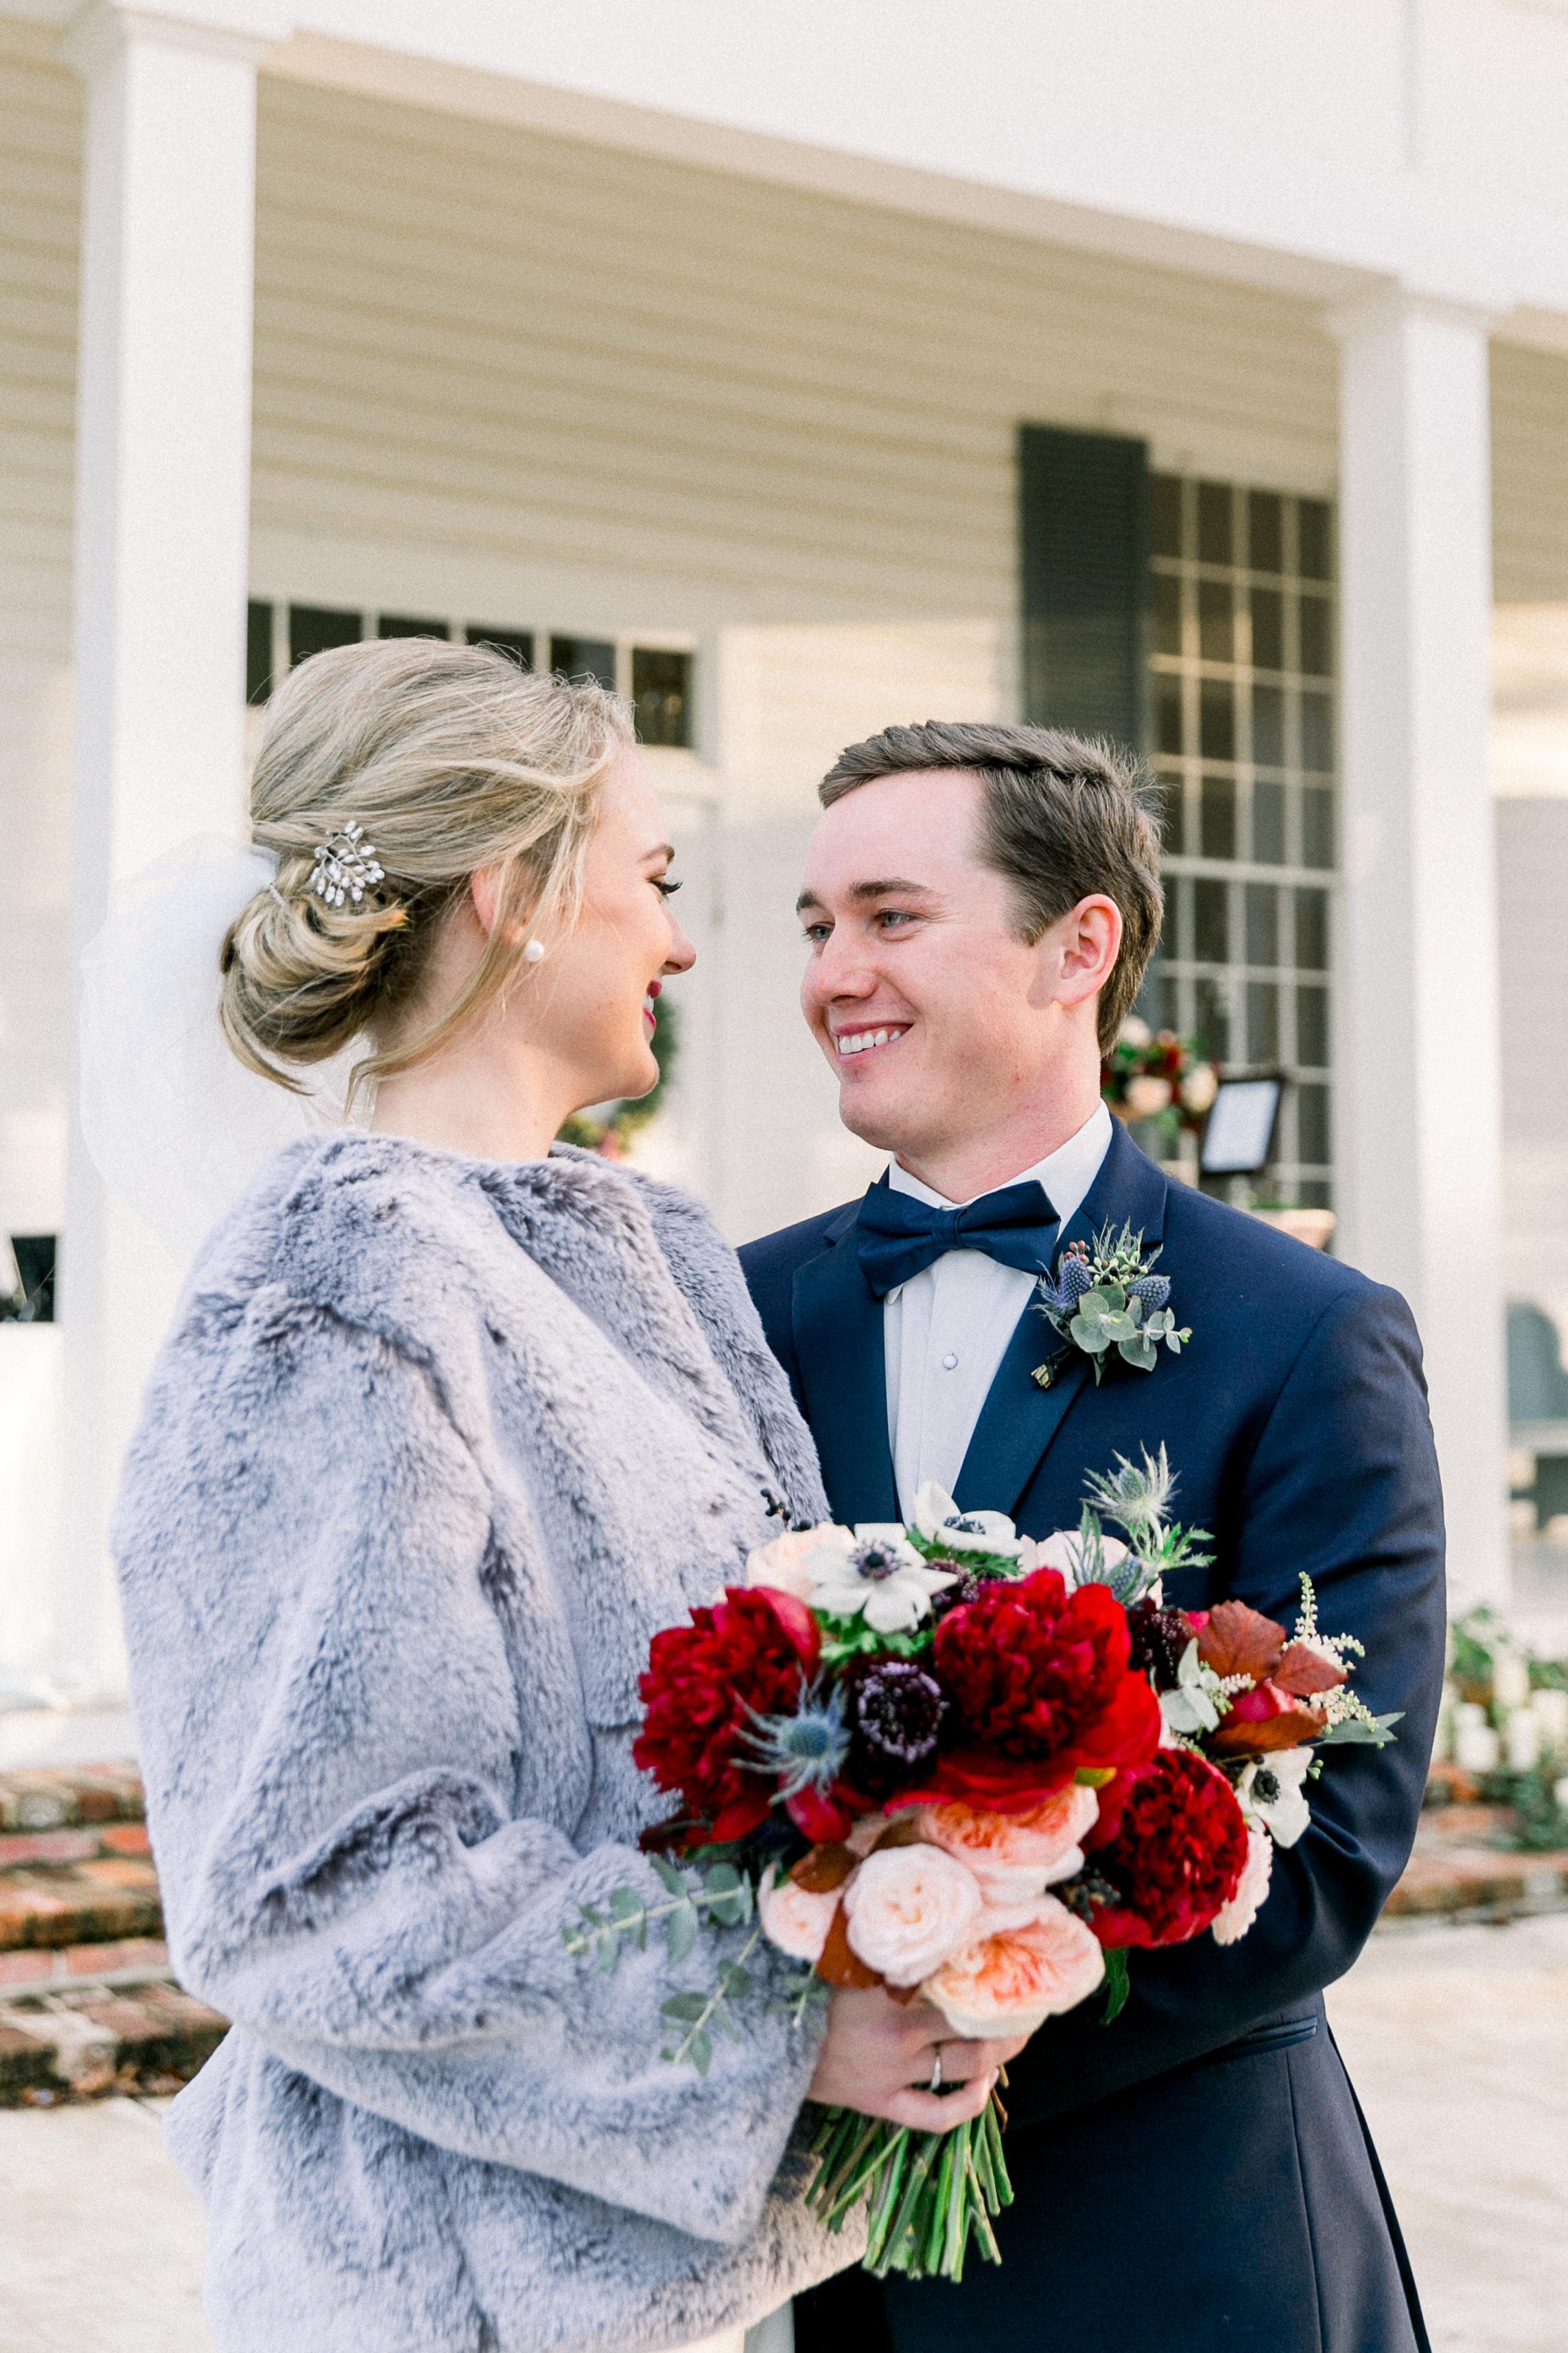 464_Rachel & Drew Wedding__Ports_Lindsay Ott Photog_2018.jpg